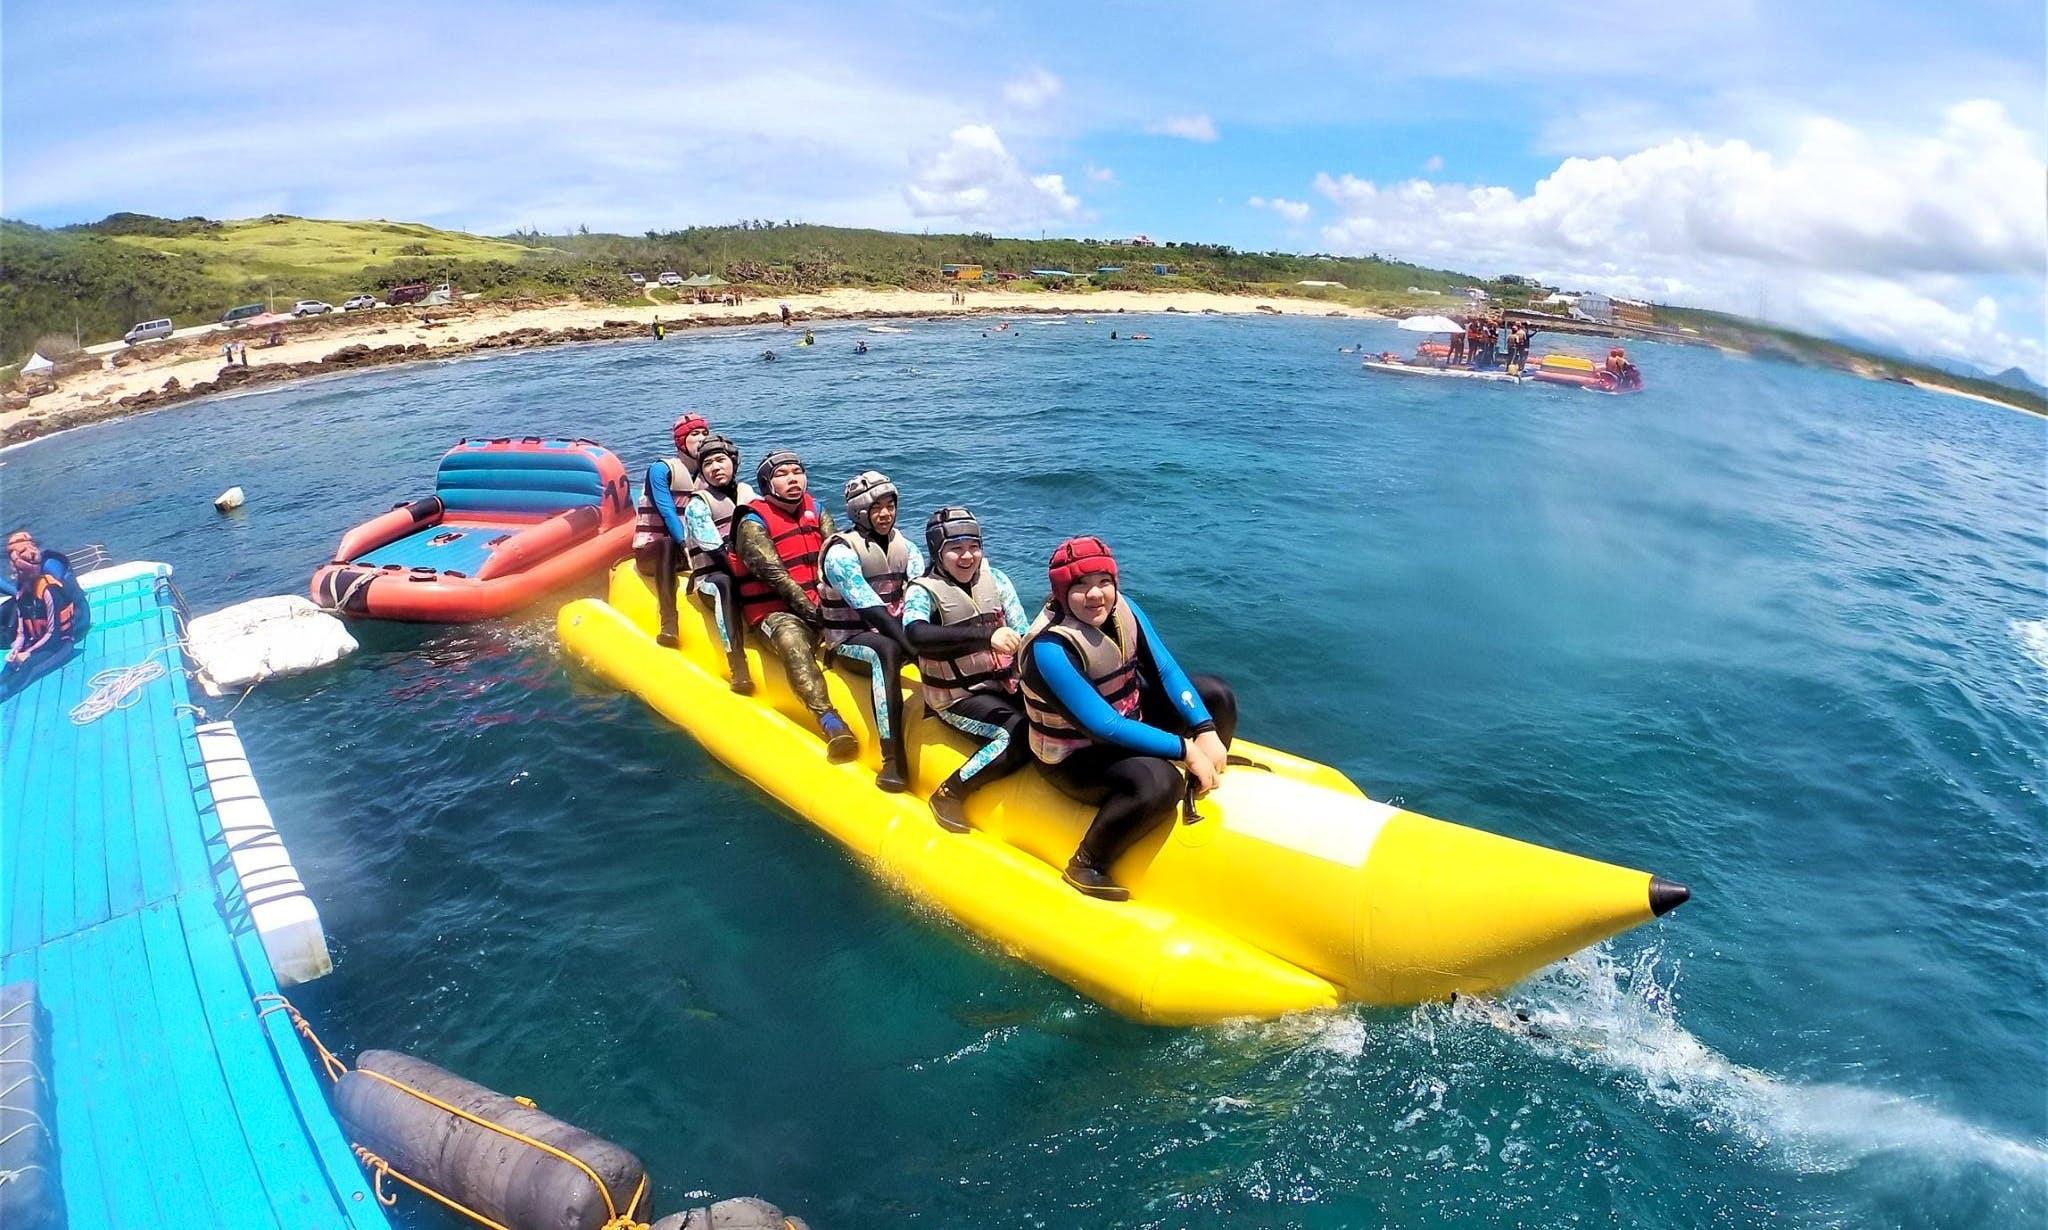 Exciting Banana Boat Adventure in Hengchun Township, Taiwan